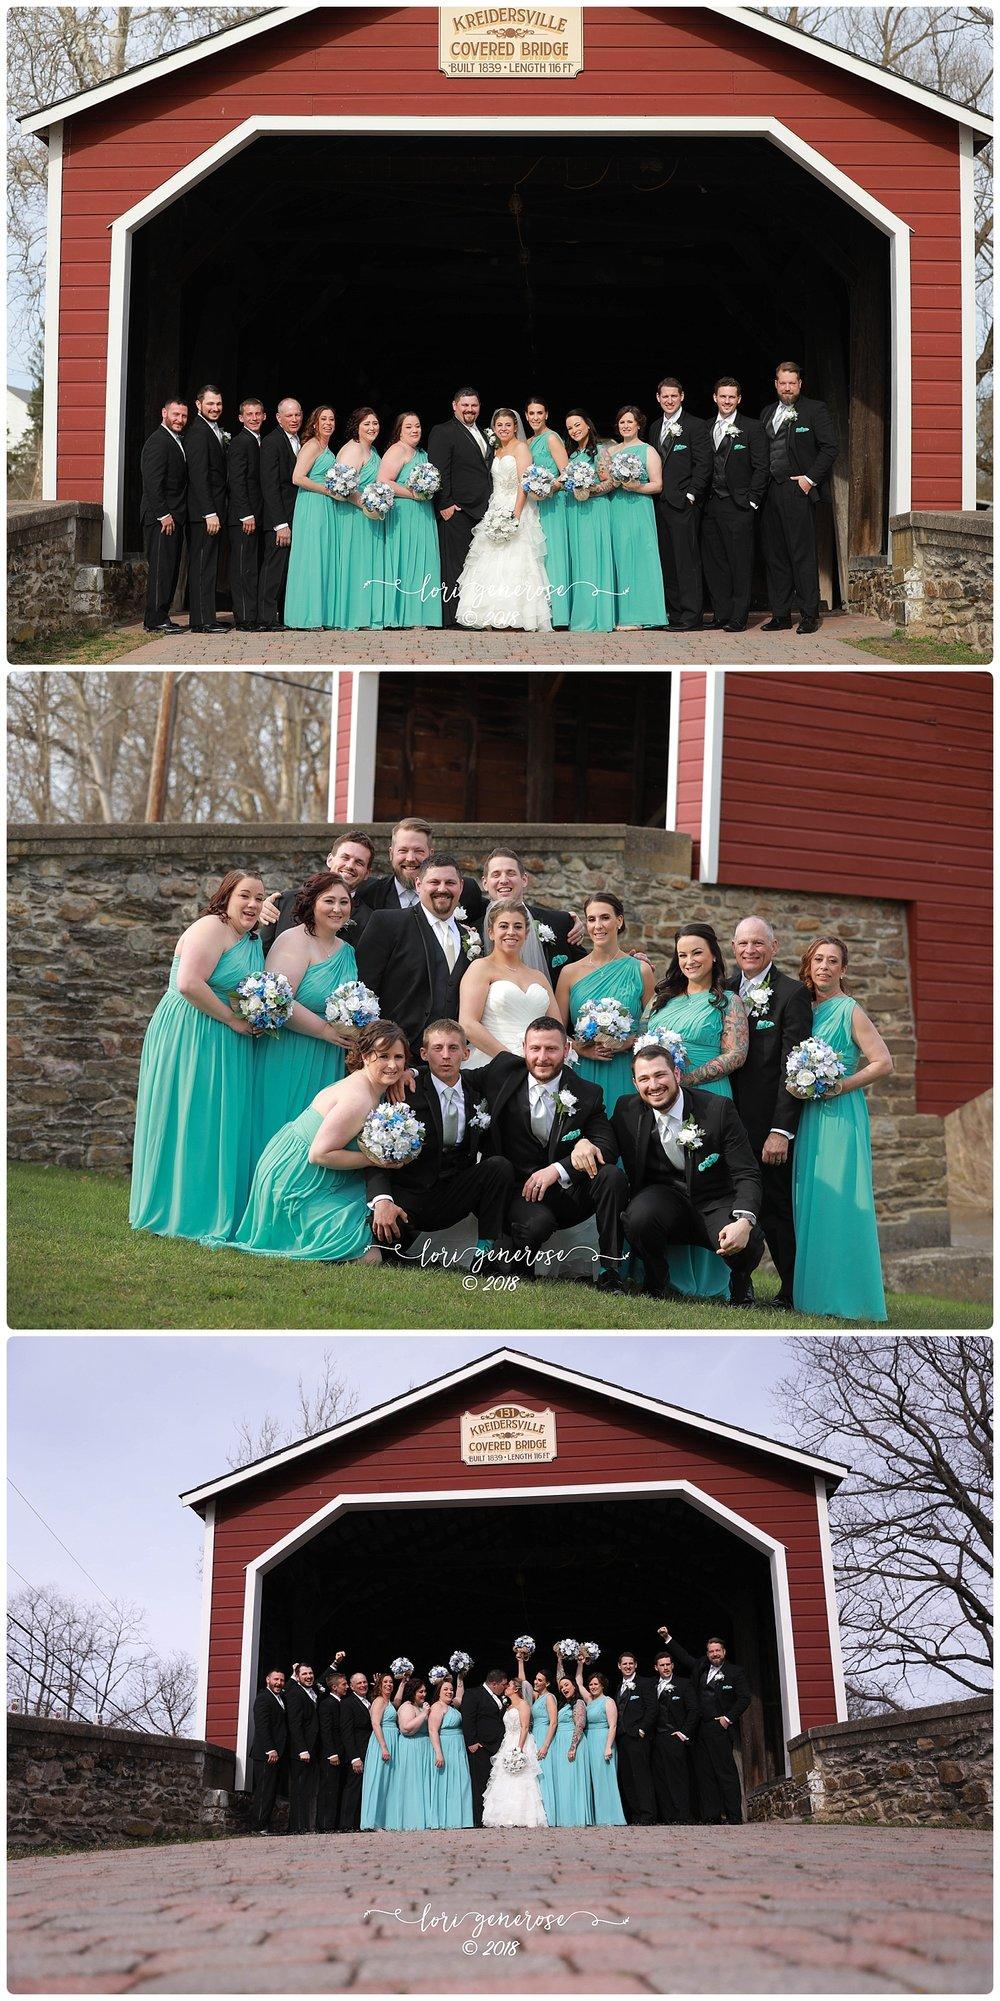 bridalpartyformalsatkreidersvillecoveredbridgenorthamptonpalgphotography.jpg